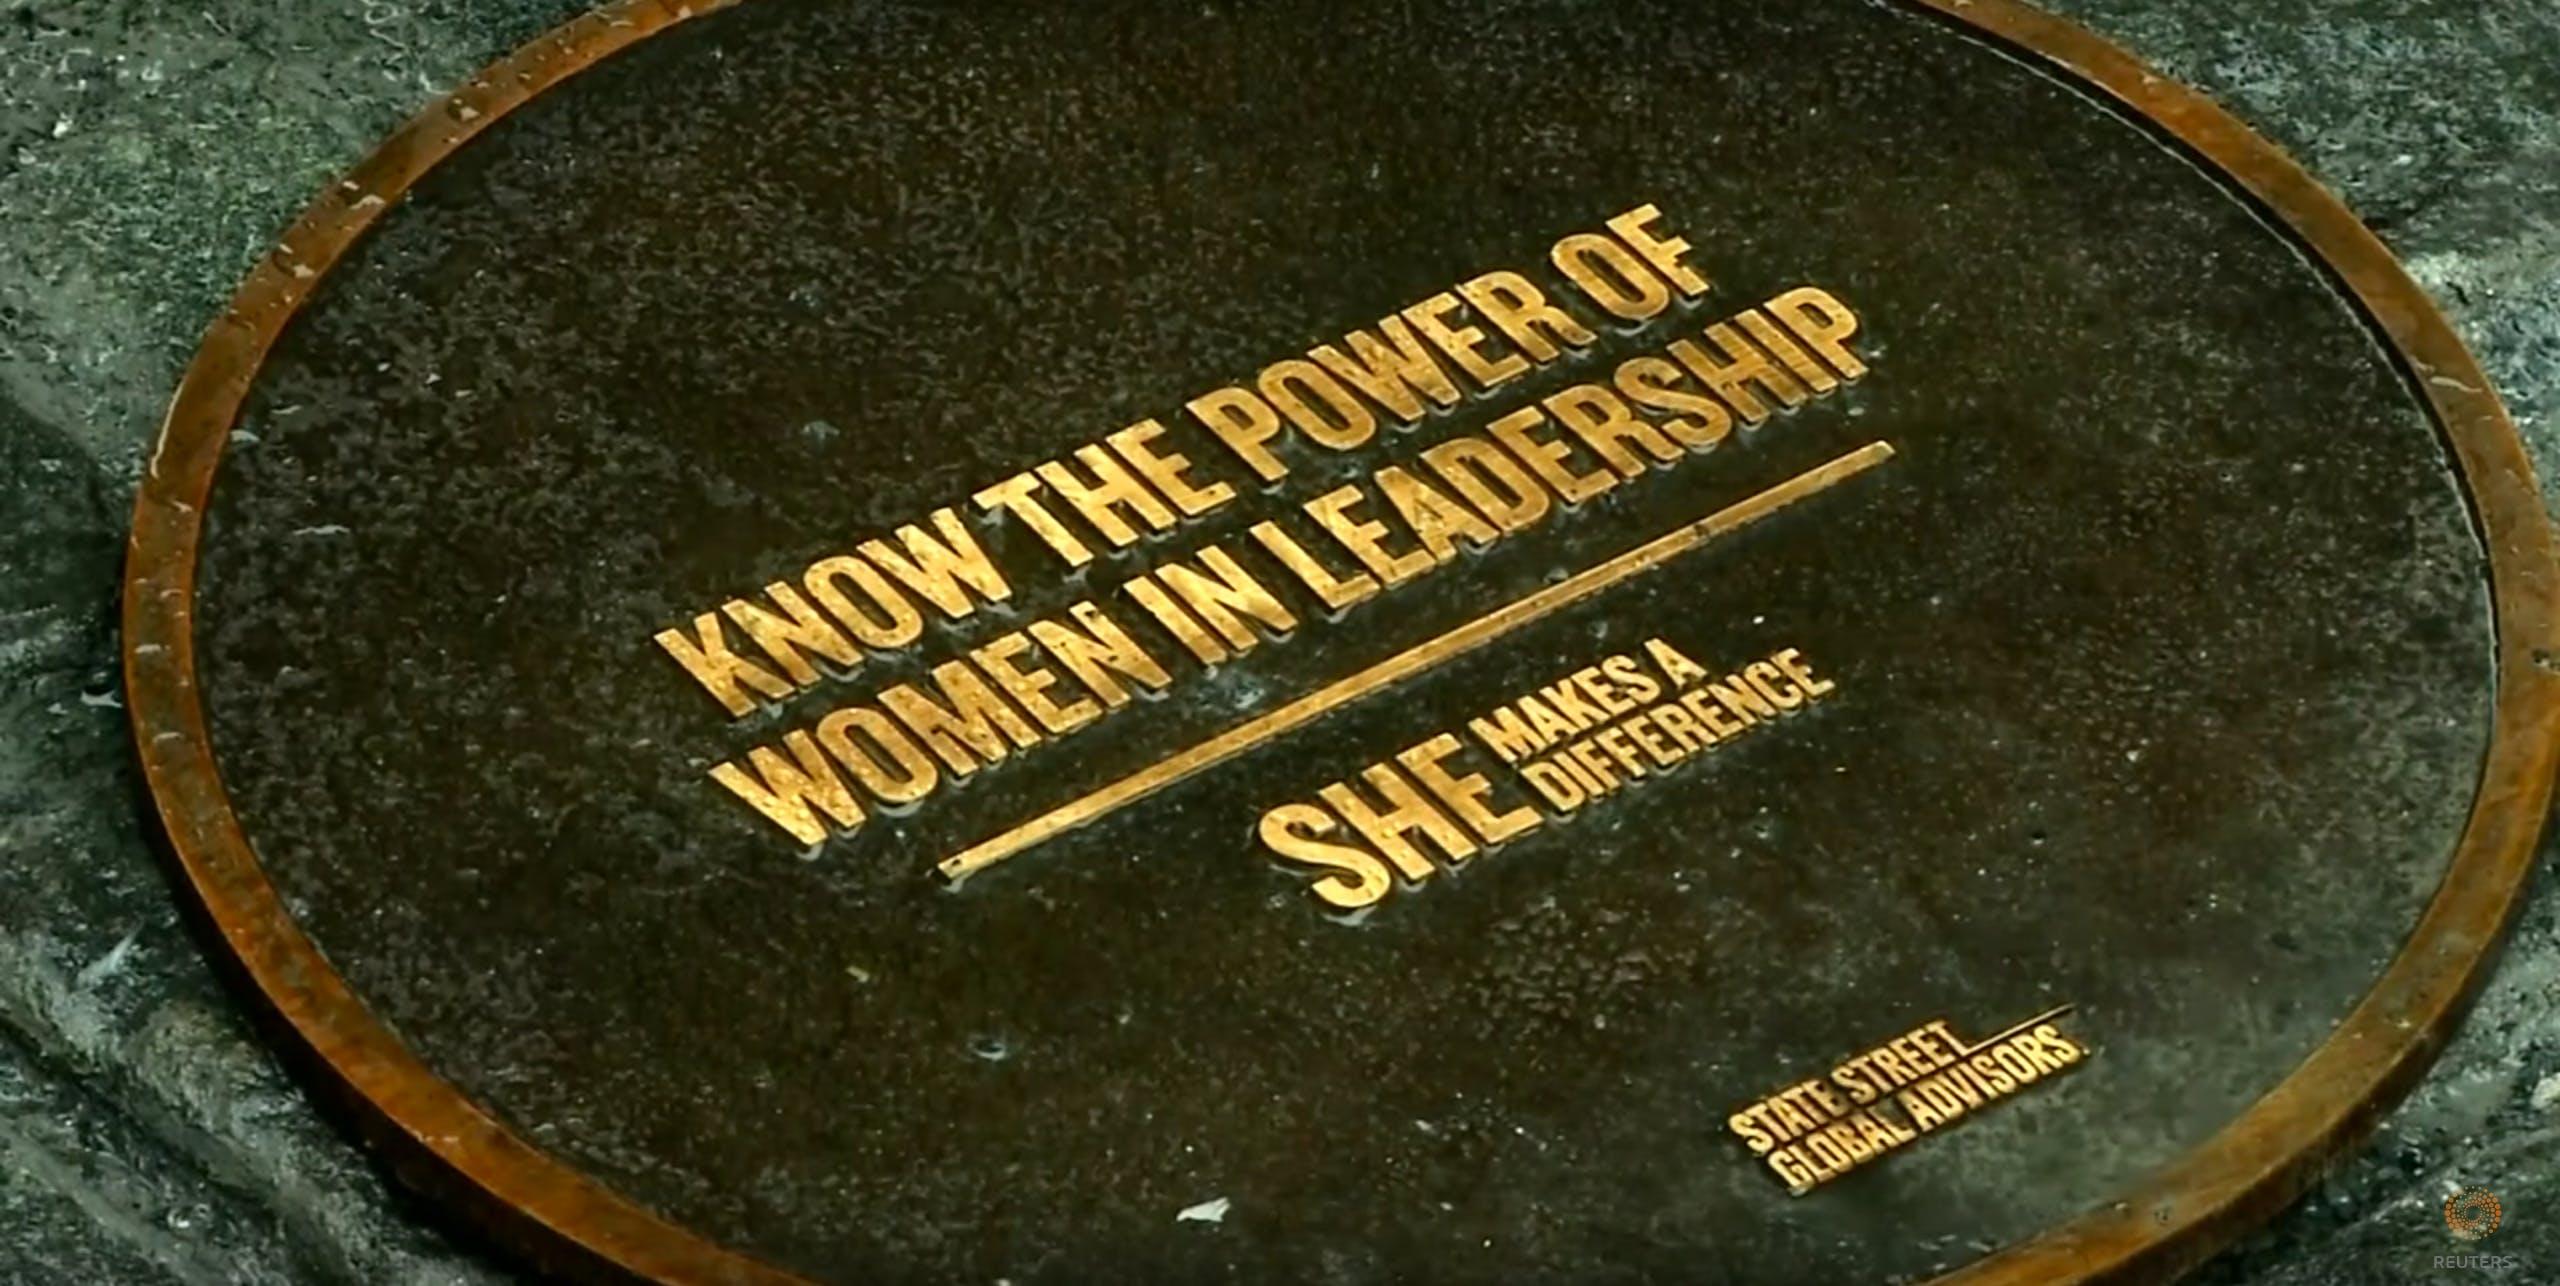 Wall Street statue plaque